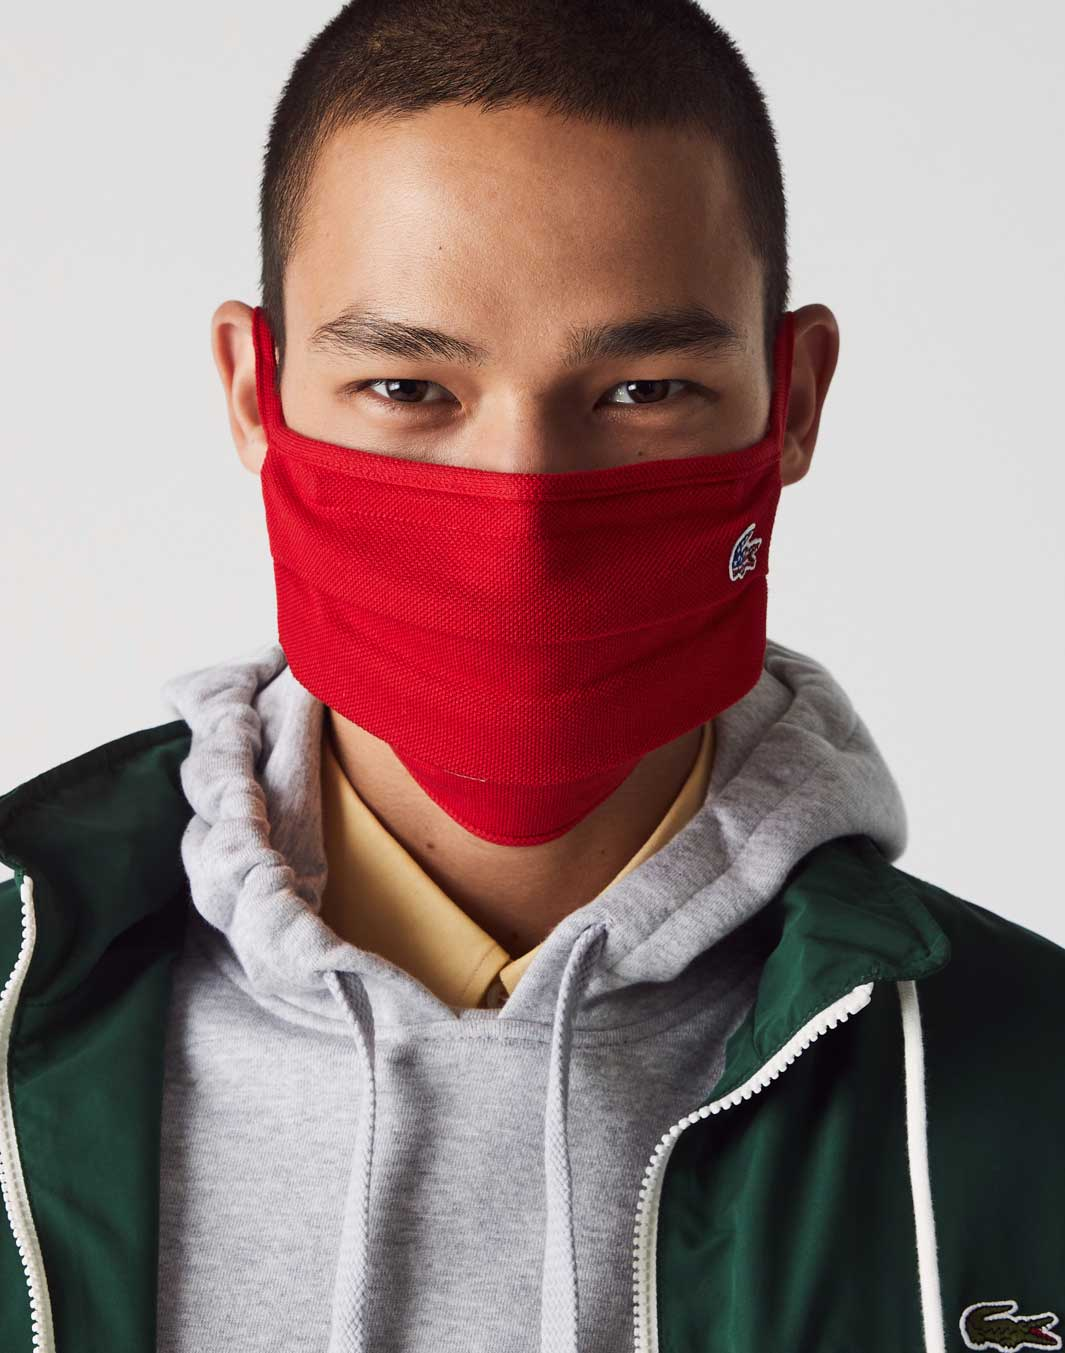 Shop Face Masks at DrJays.com